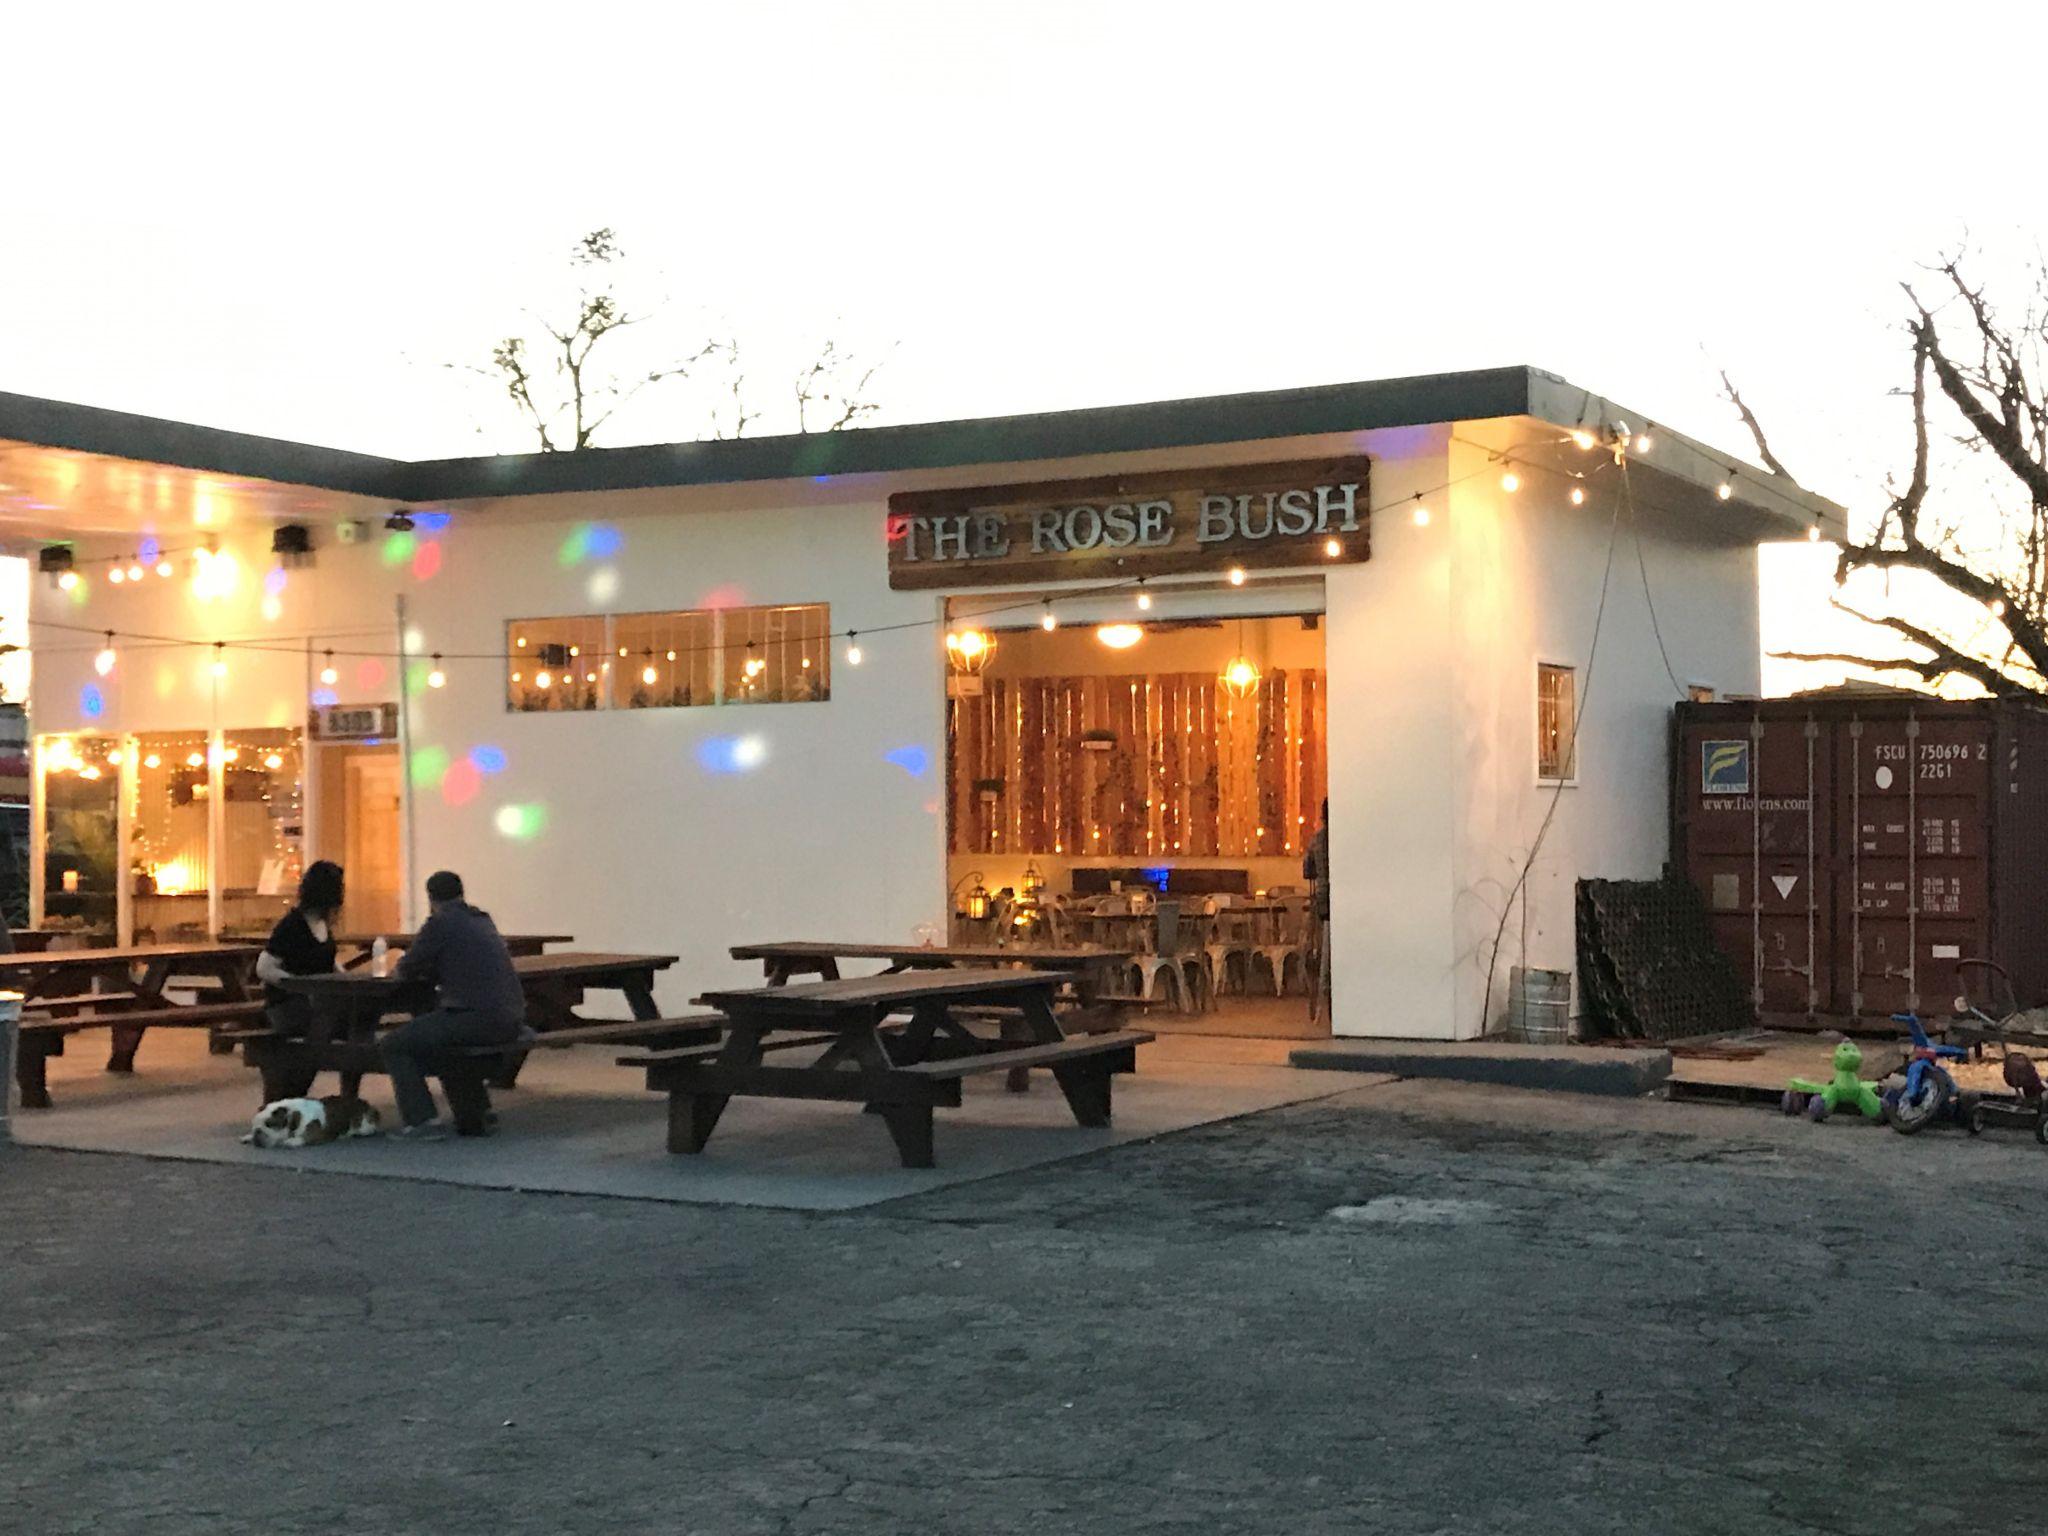 New food truck park open near Monte Vista - mySanAntonio.com